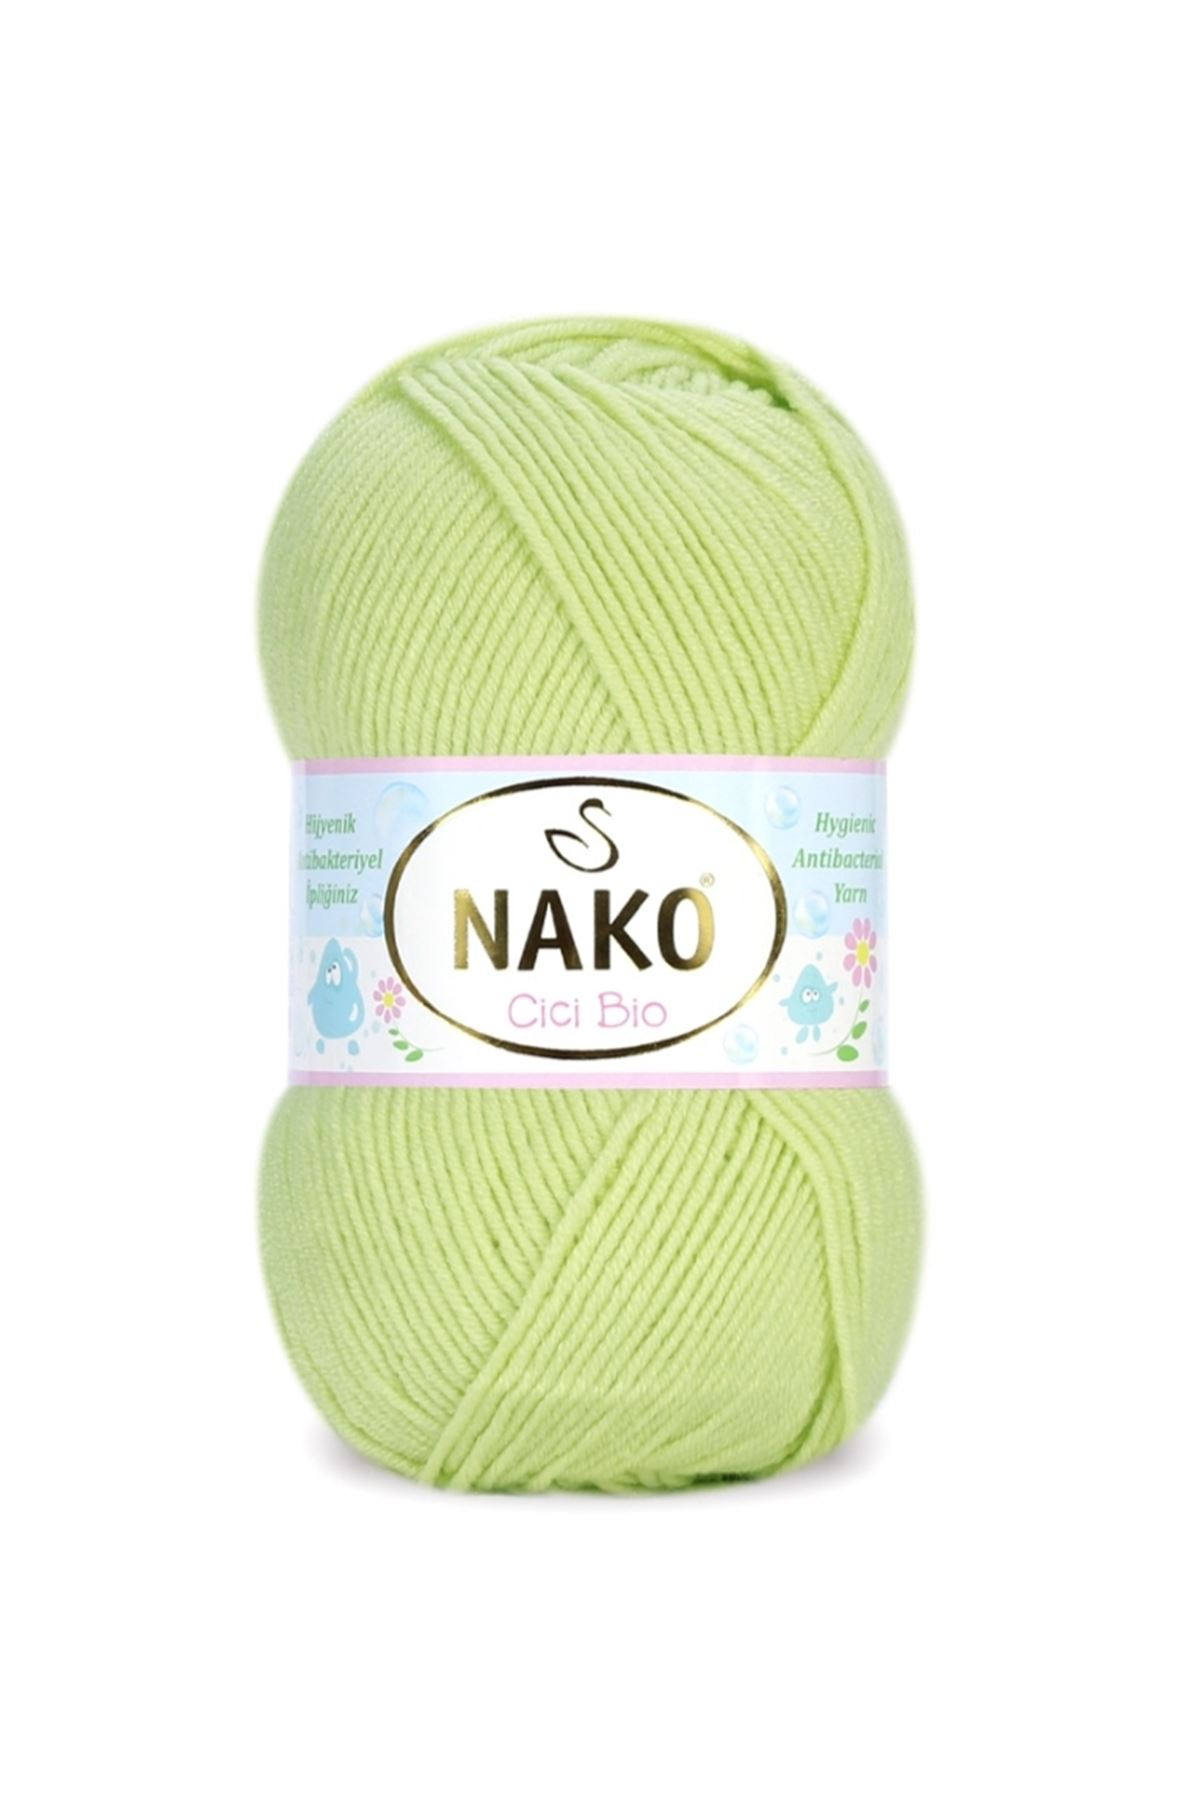 Nako Cici Bio 6811 Açık Yeşil